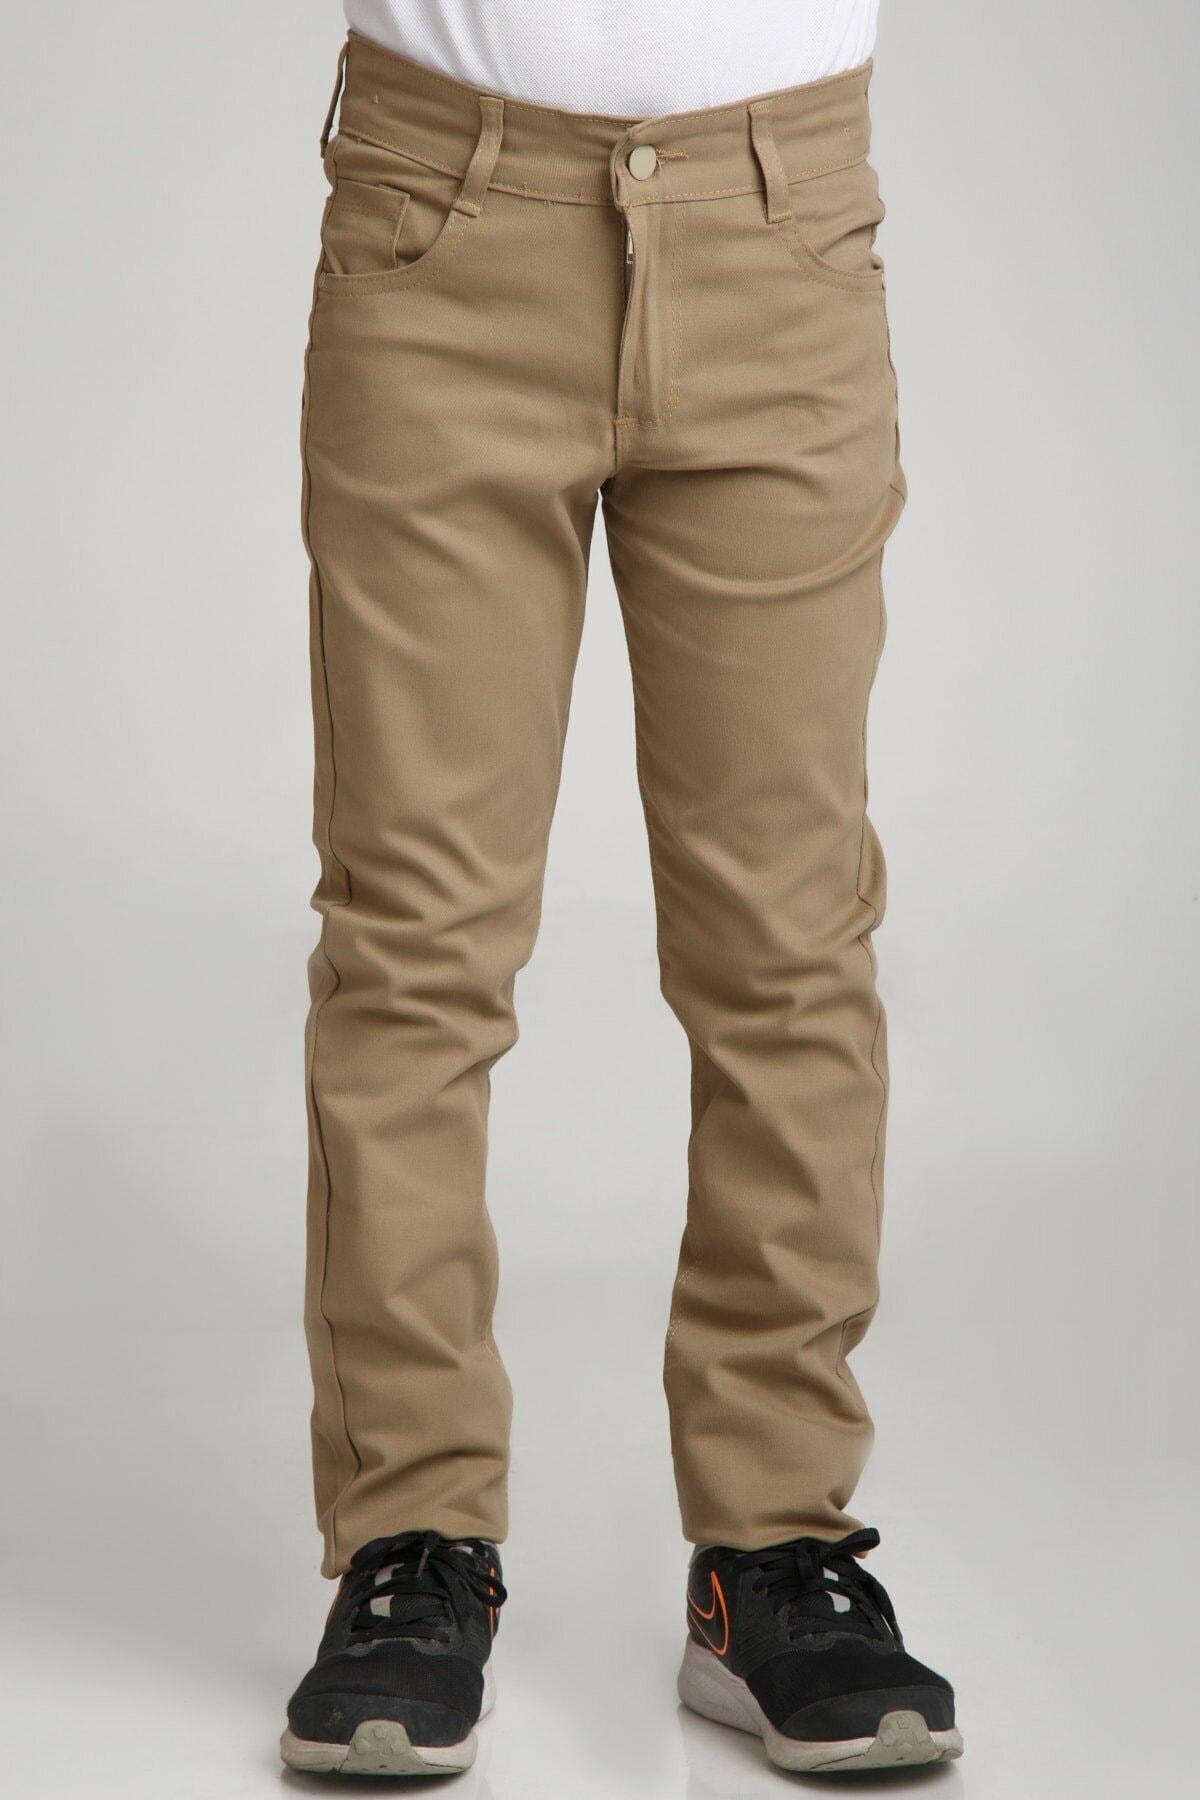 Unısex Spor Model Camel Canvas Pantolon